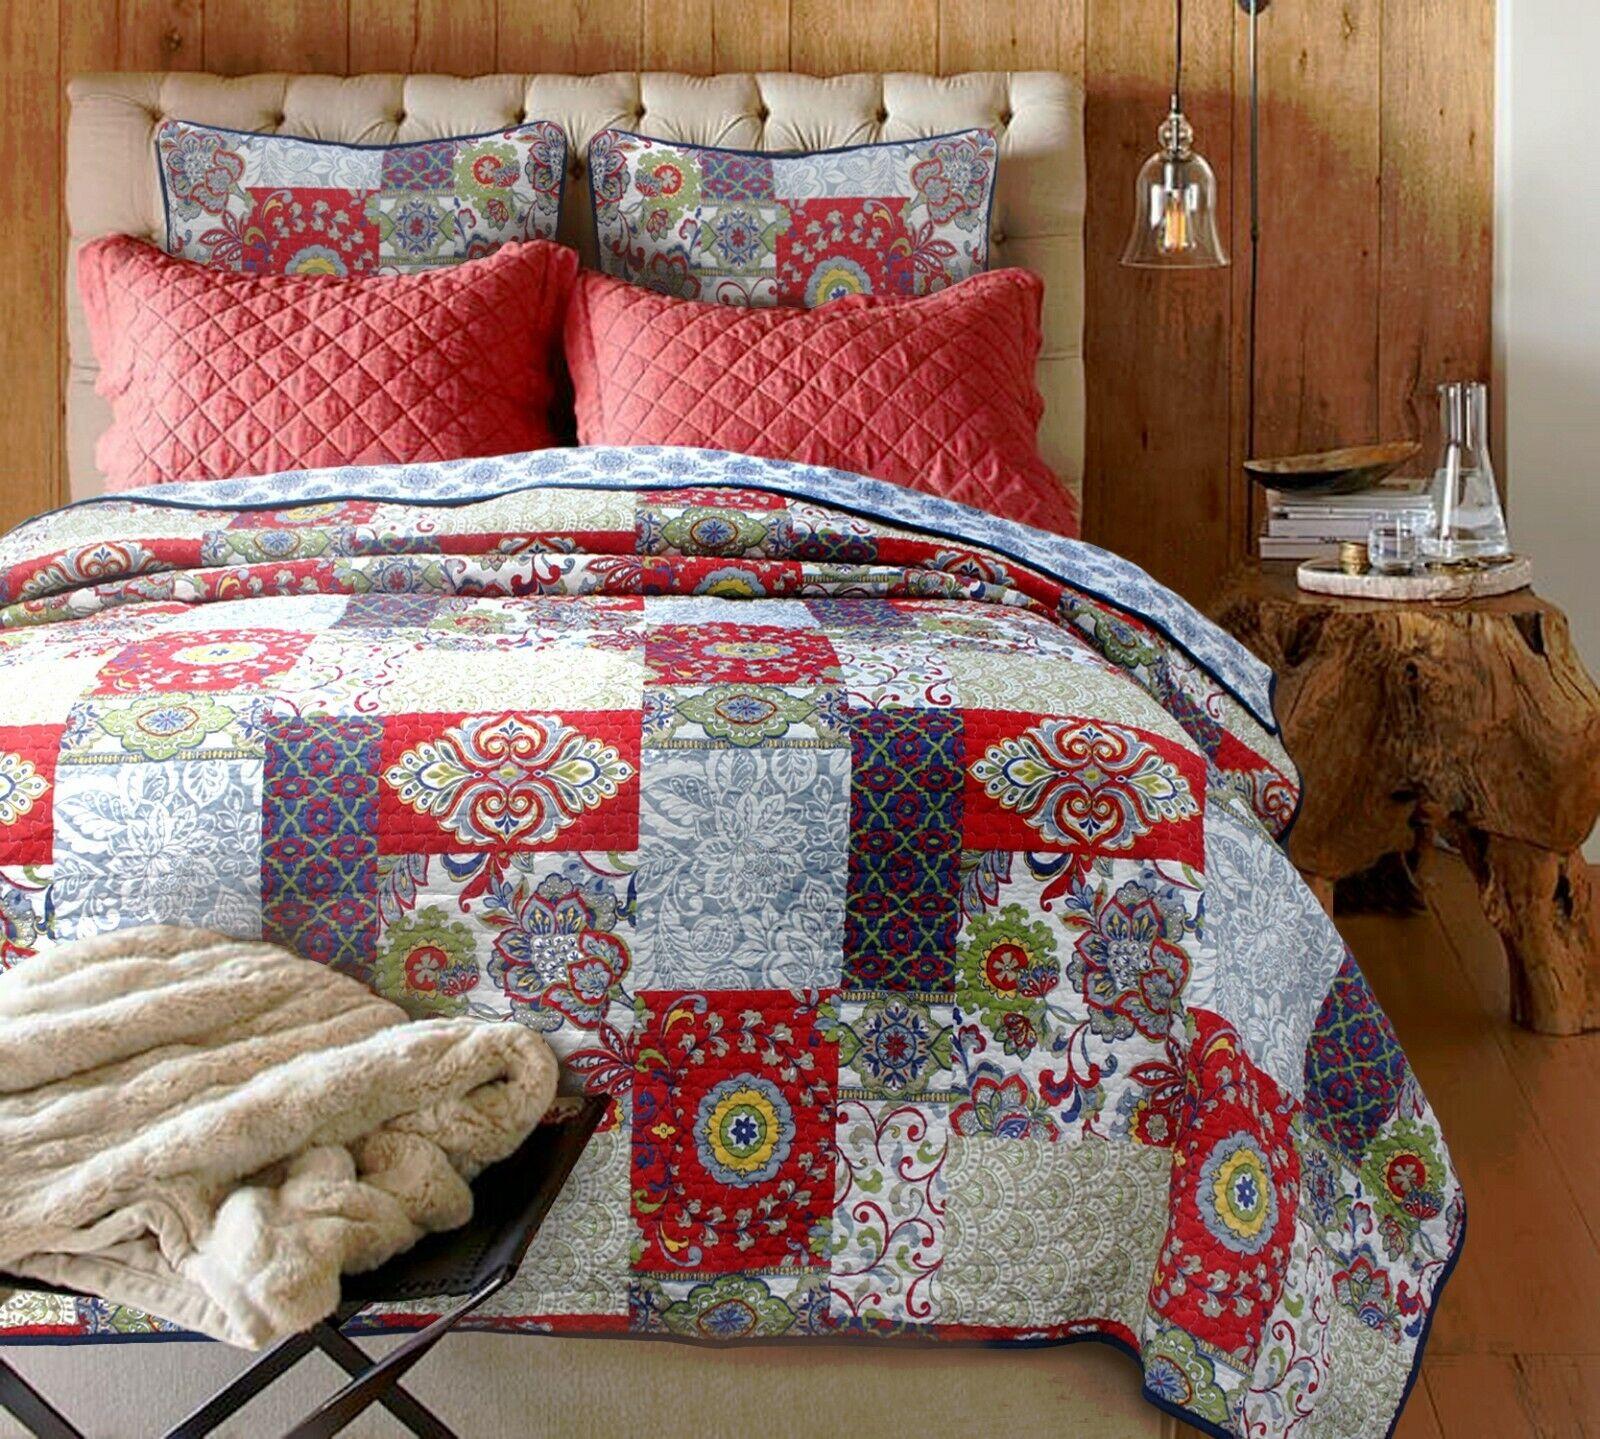 Vintage Garden Reversible Cotton Quilt Set, Bedspreads, Coverlet